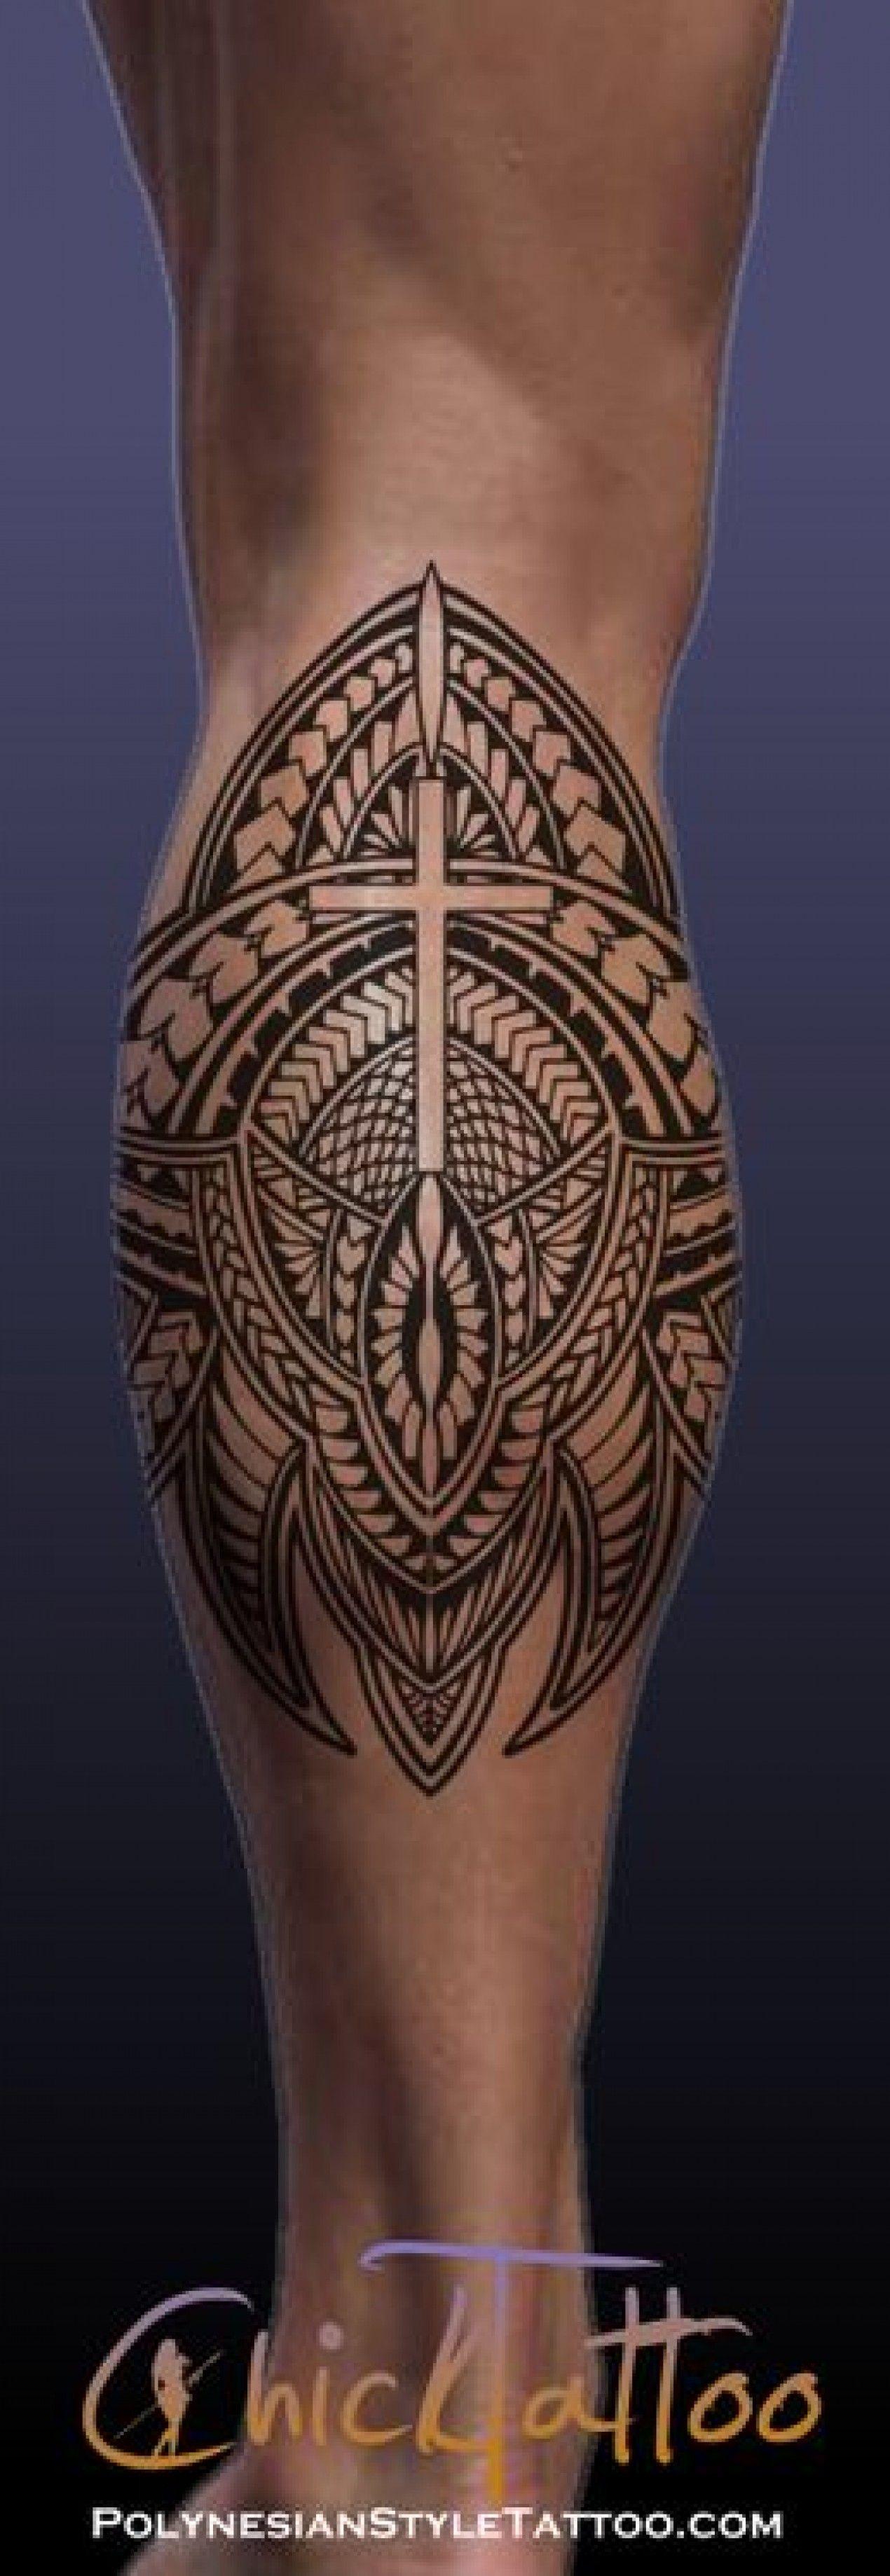 Photo de tatouage polyn sien mollet tatoo pinterest photo de tatouage tatouages - Tatouage mollet polynesien ...